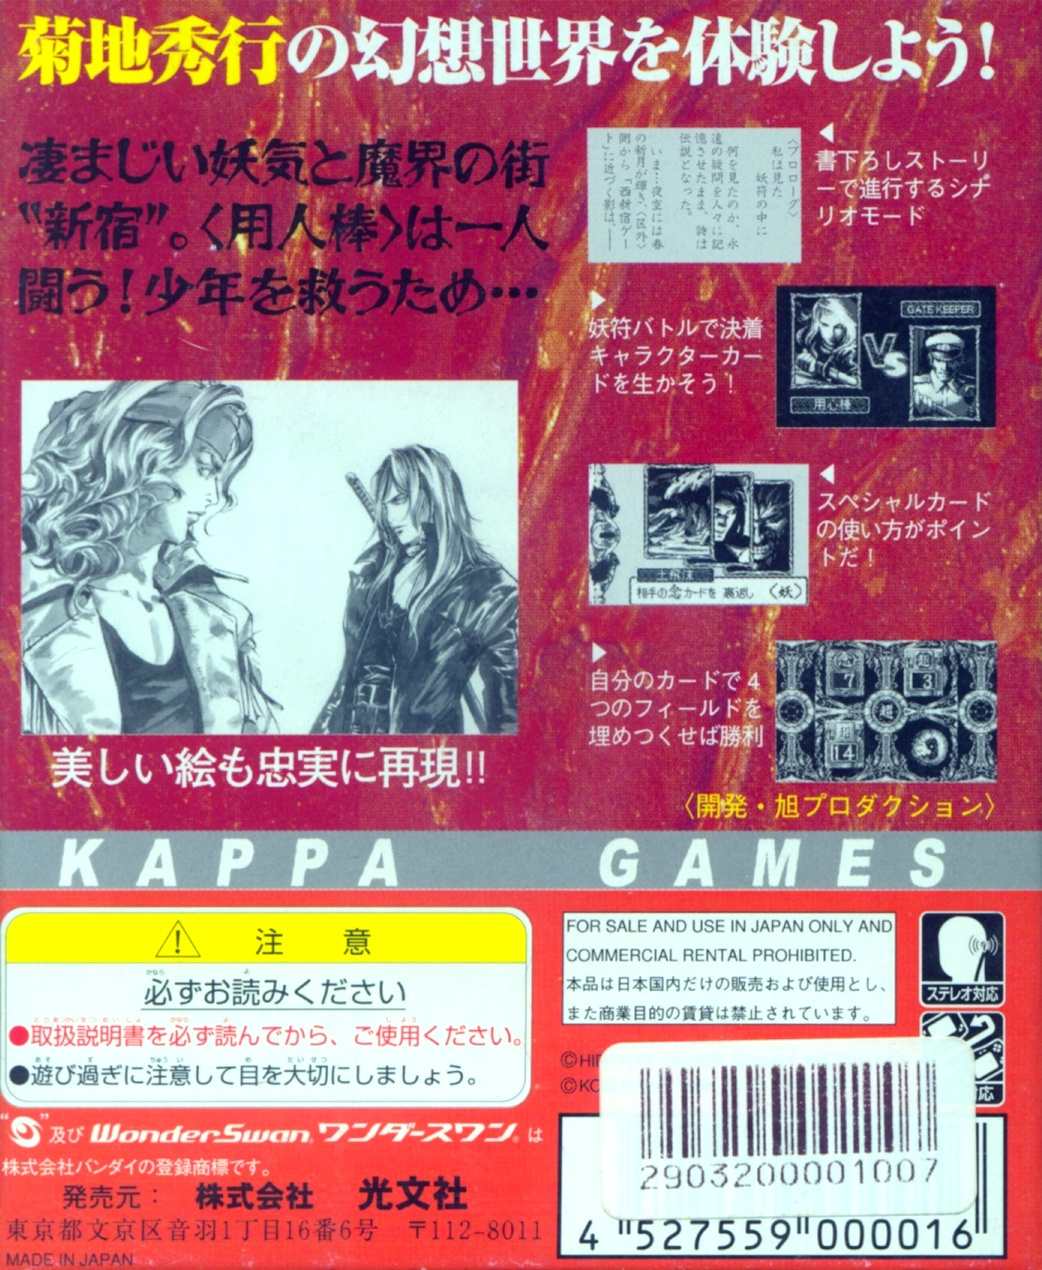 Back boxart of the game Chou Denki Card Battle - Youfu Makai (Japan) on Bandai WonderSwan